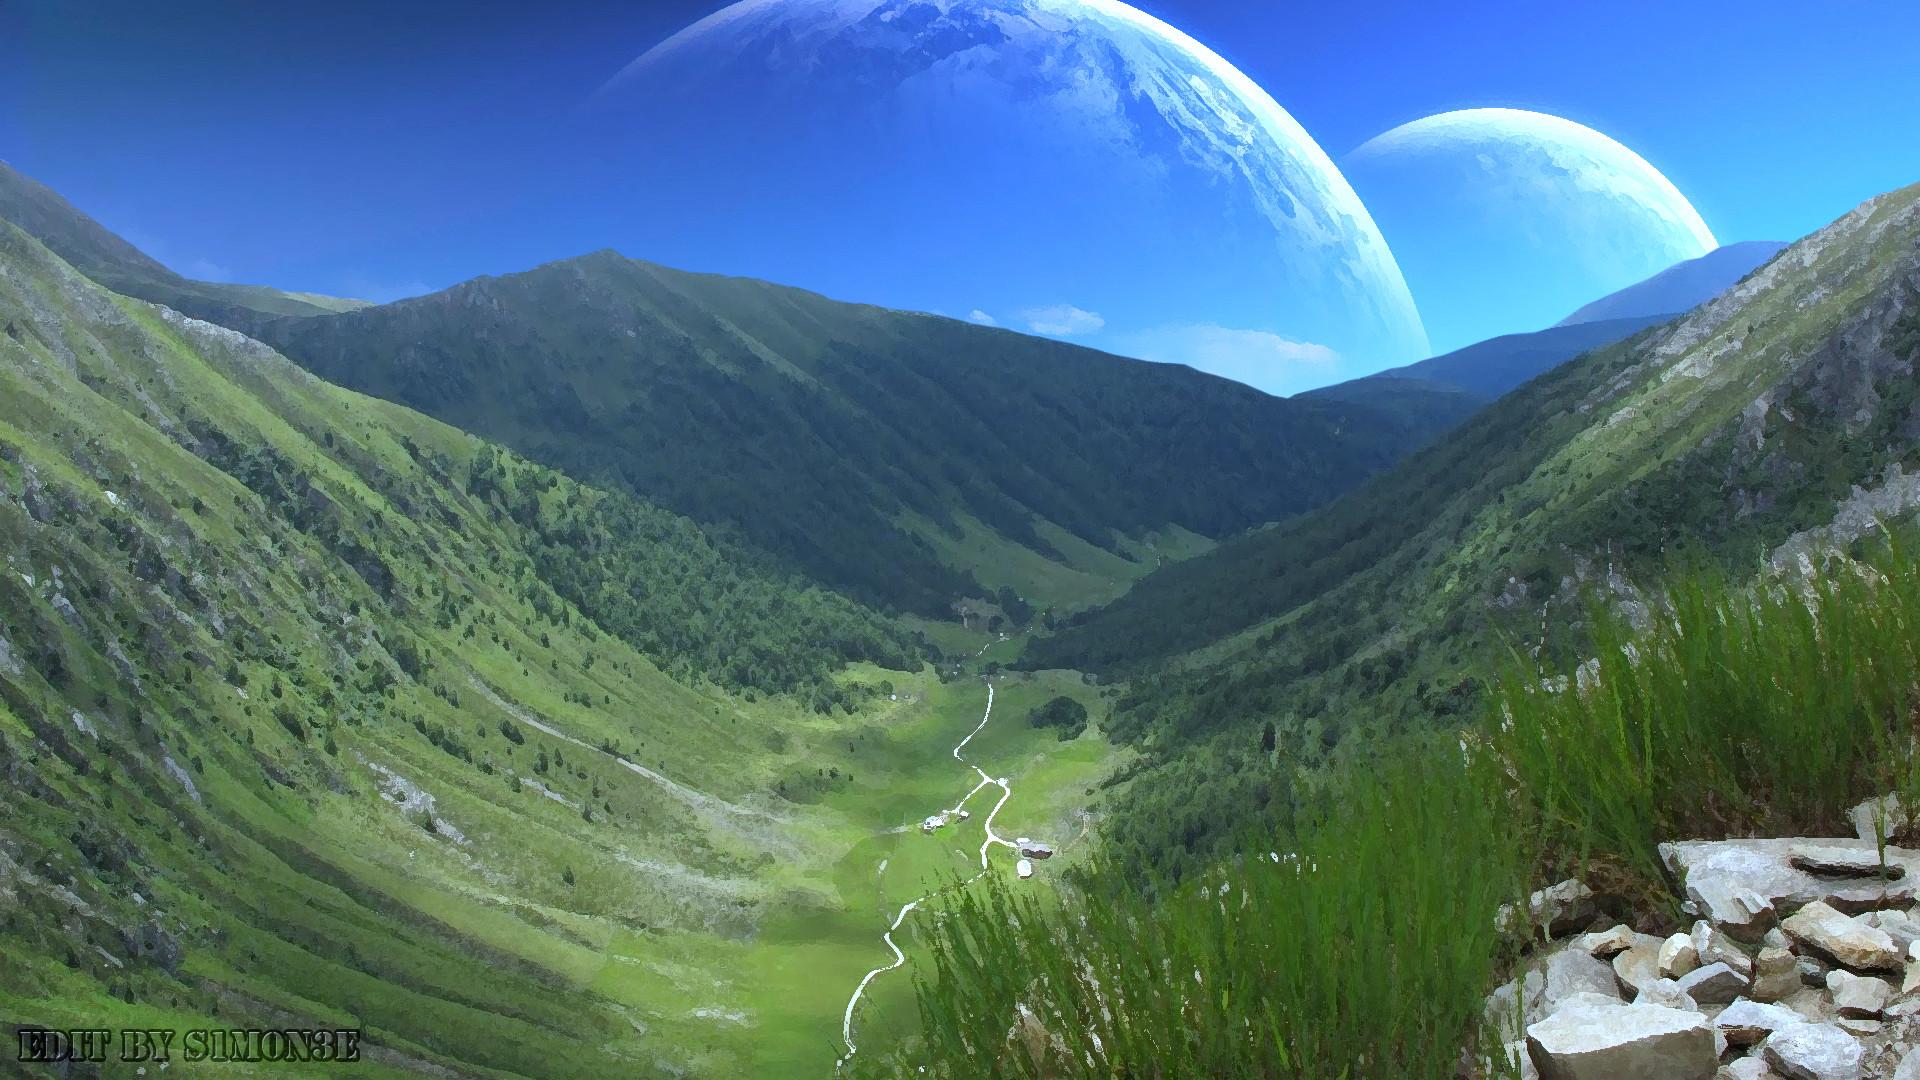 alien landscape by ttllkk2 digital art other landscapes scenery 2012 .